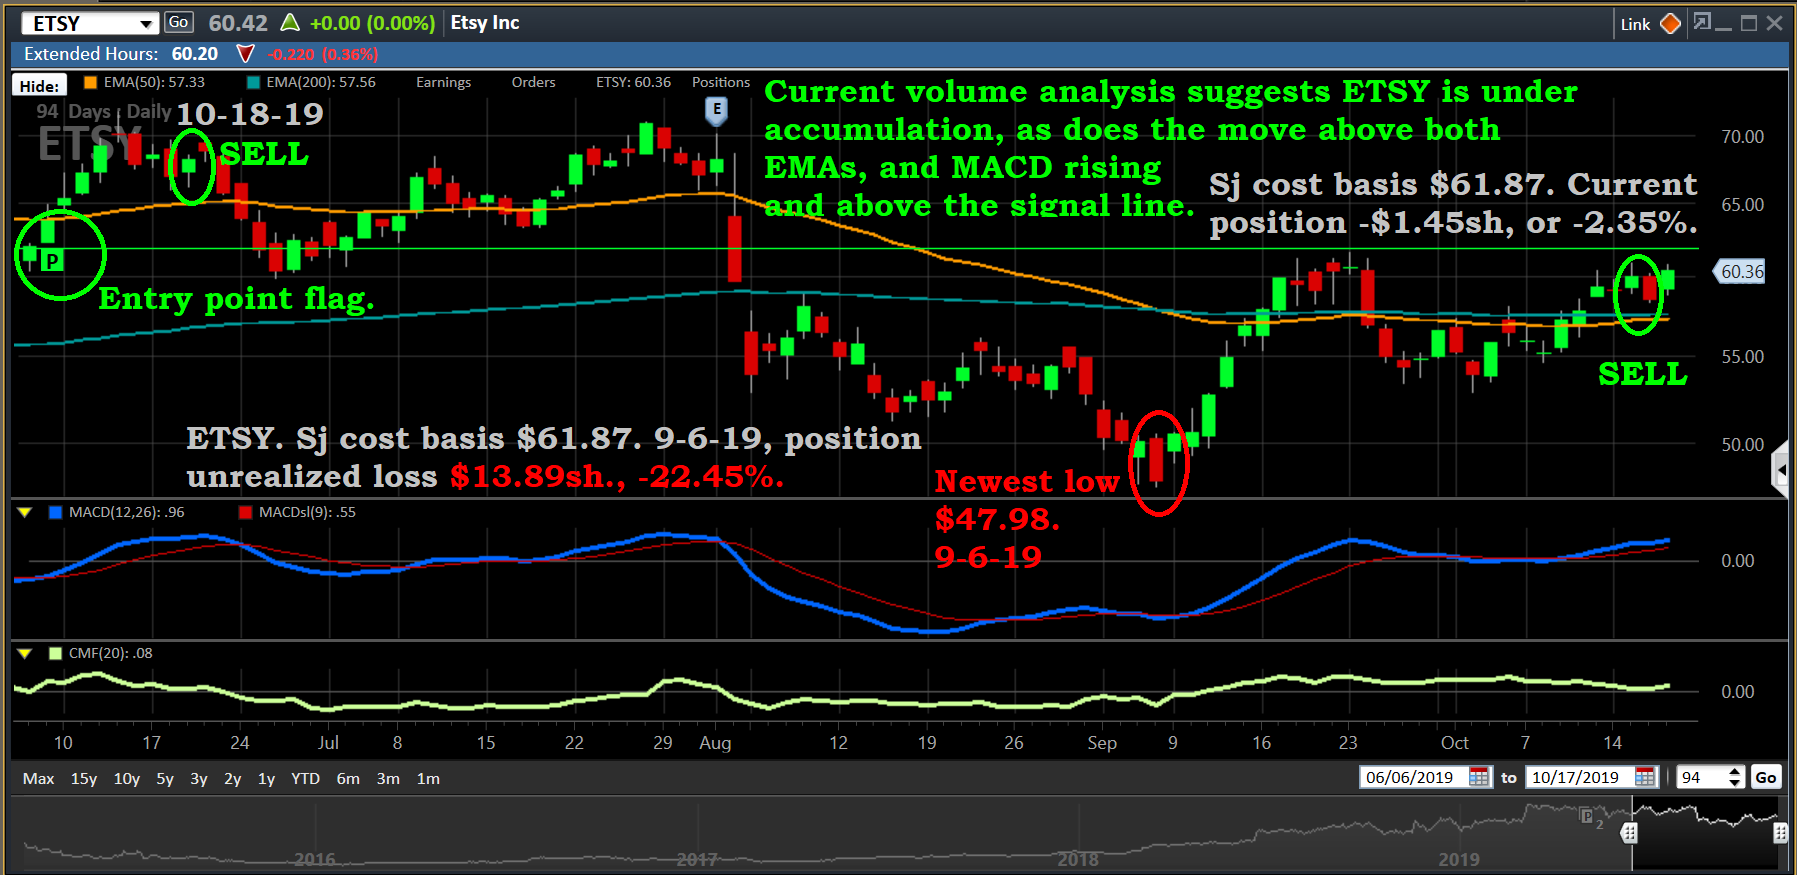 Chart, ETSY, 10-18-19